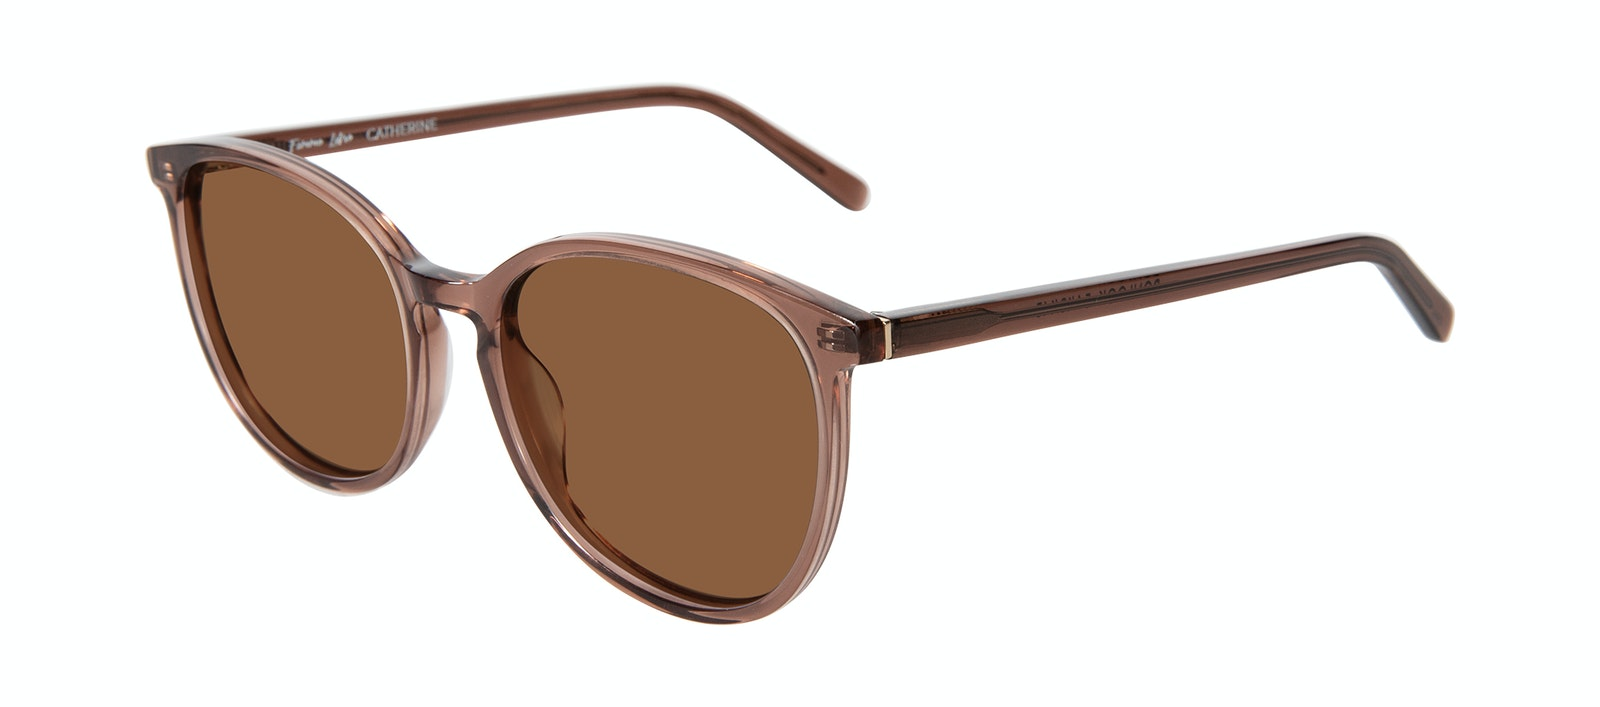 Affordable Fashion Glasses Round Sunglasses Women Femme Libre Catherine Tilt